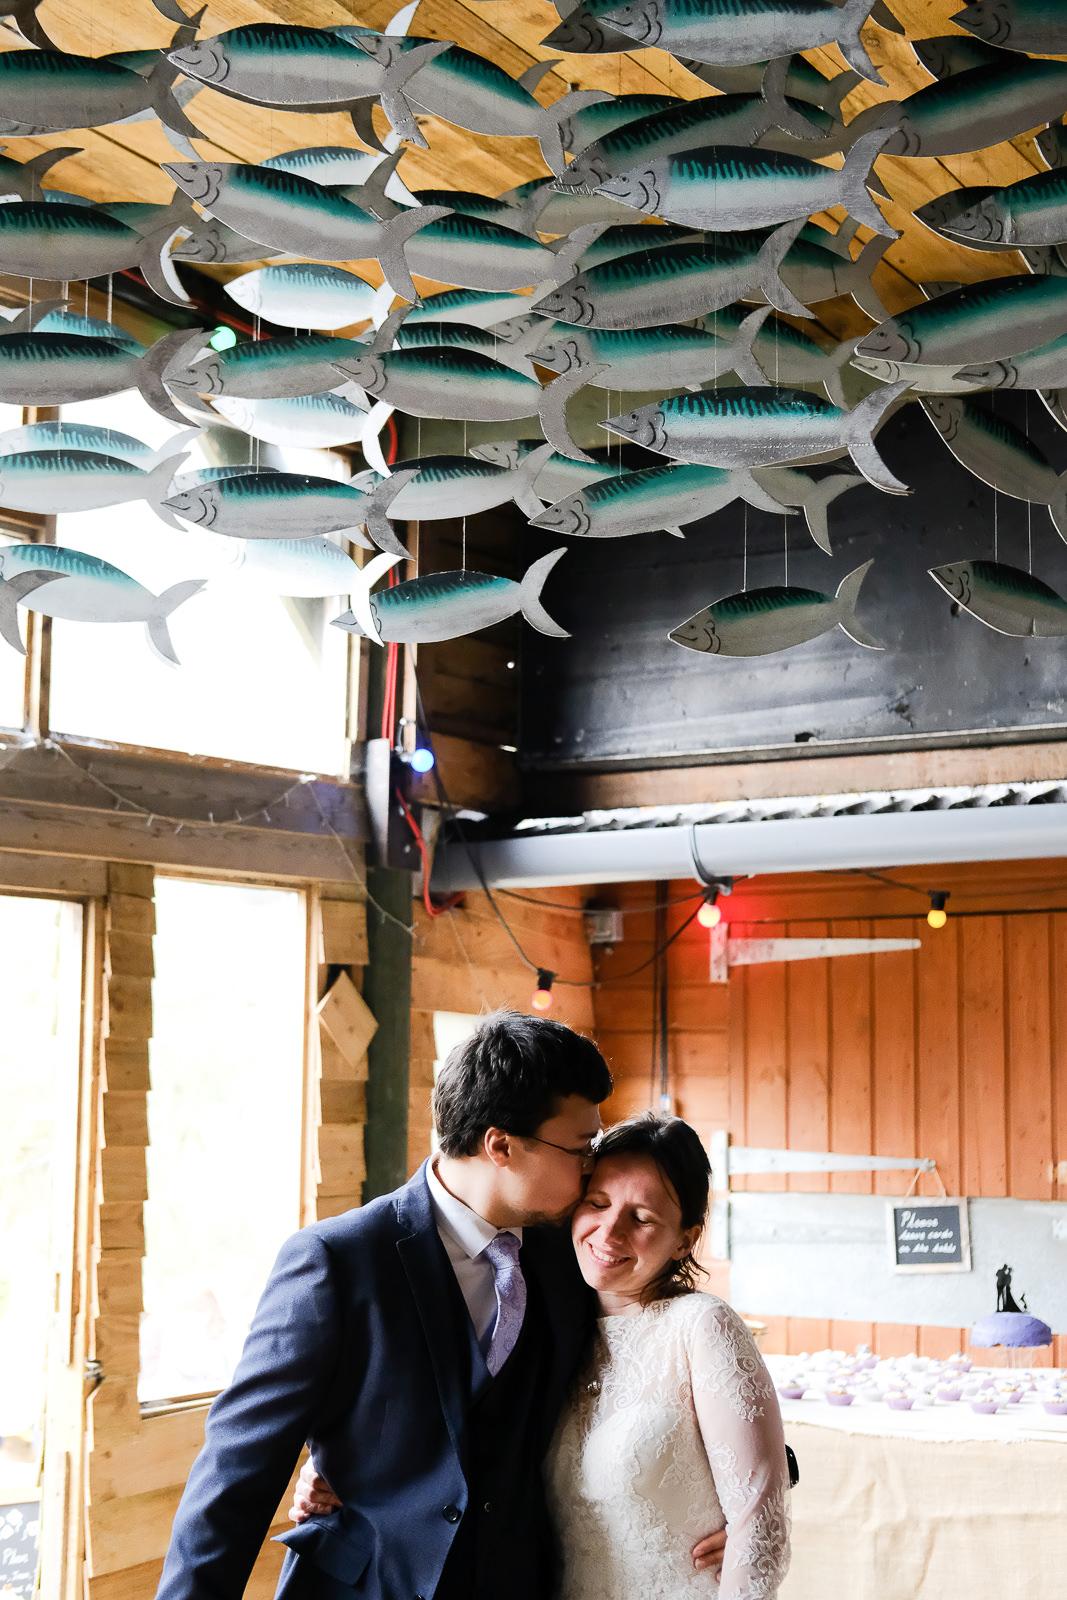 Retorrick Mill Newquay wedding 080.jpg